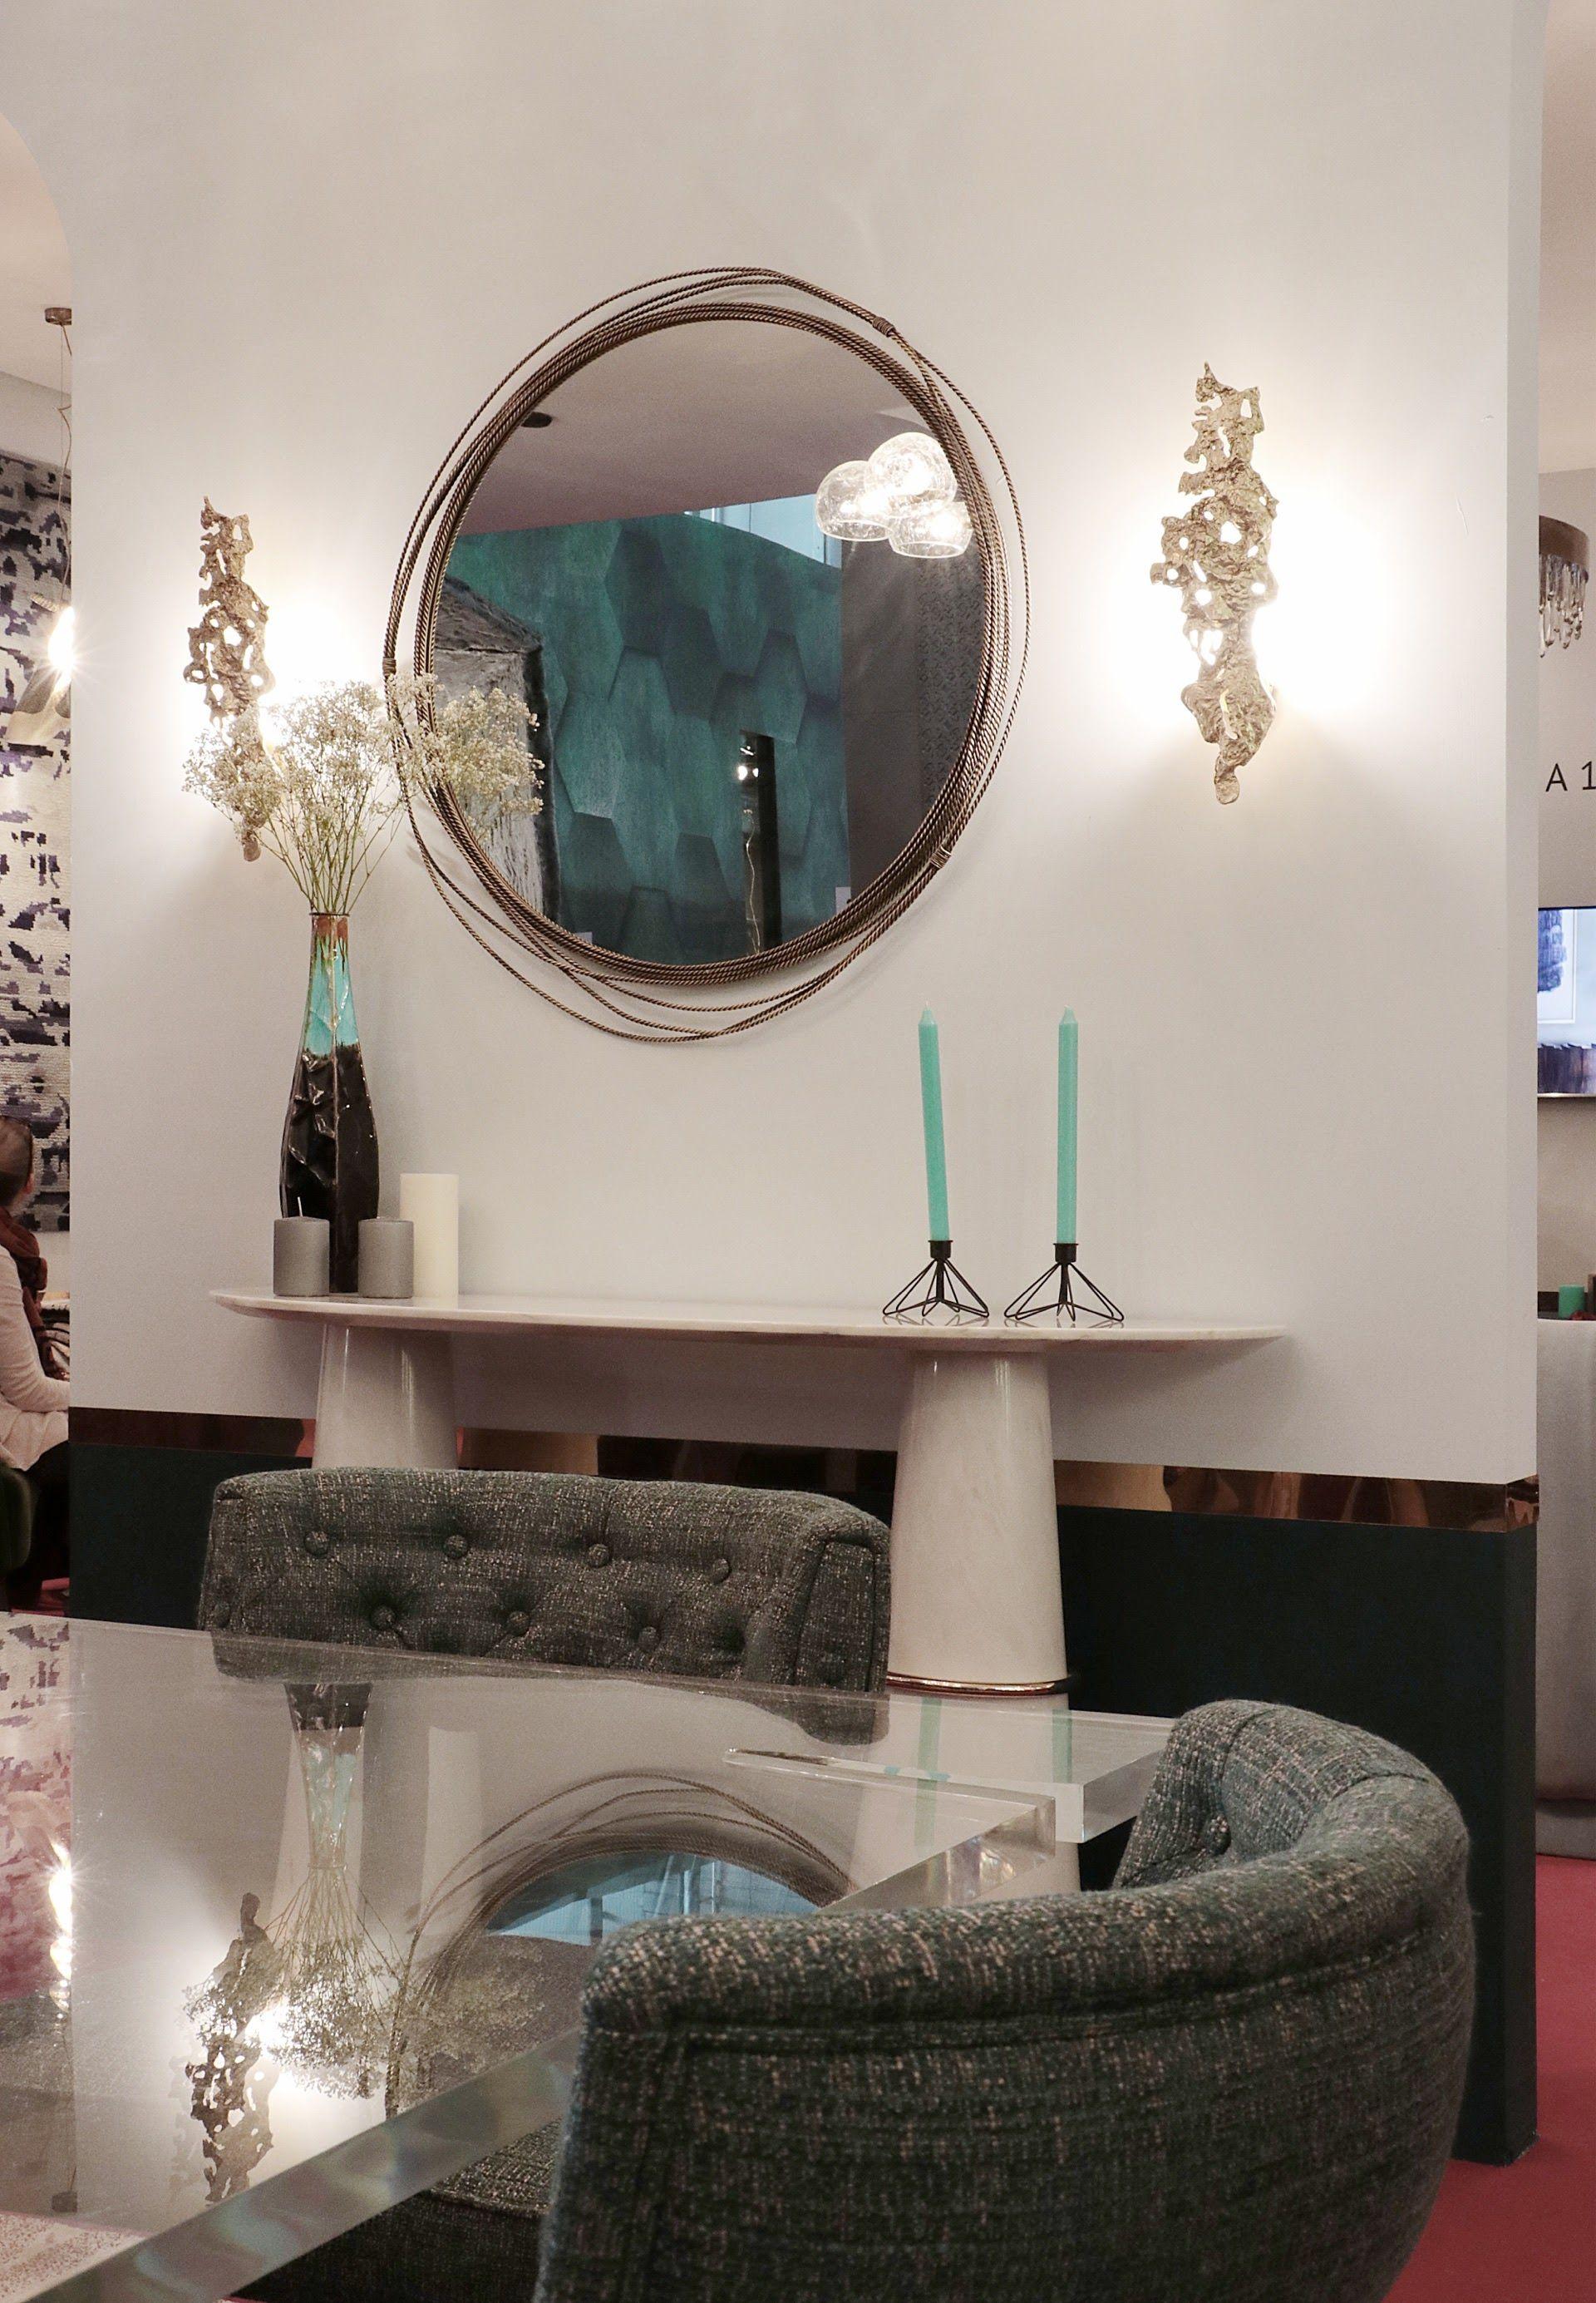 modernes mobel design, pantone farben einrichtungsideen minimalismus design modernes design, Design ideen